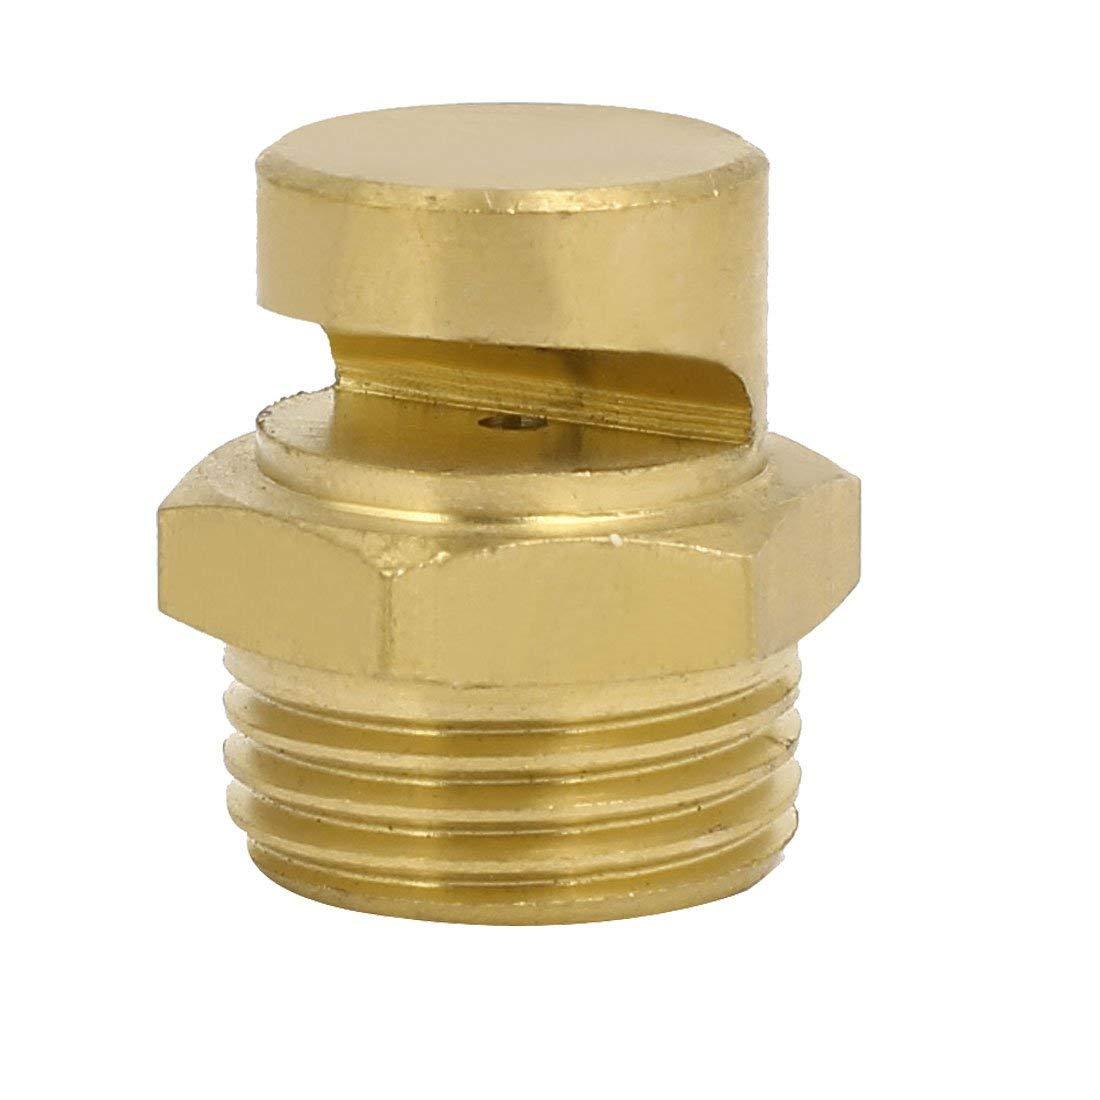 1//4BSP 2.8mm Orifice Spray Dia 95 Degree Stainless Steel Flat Fan Spray Tip